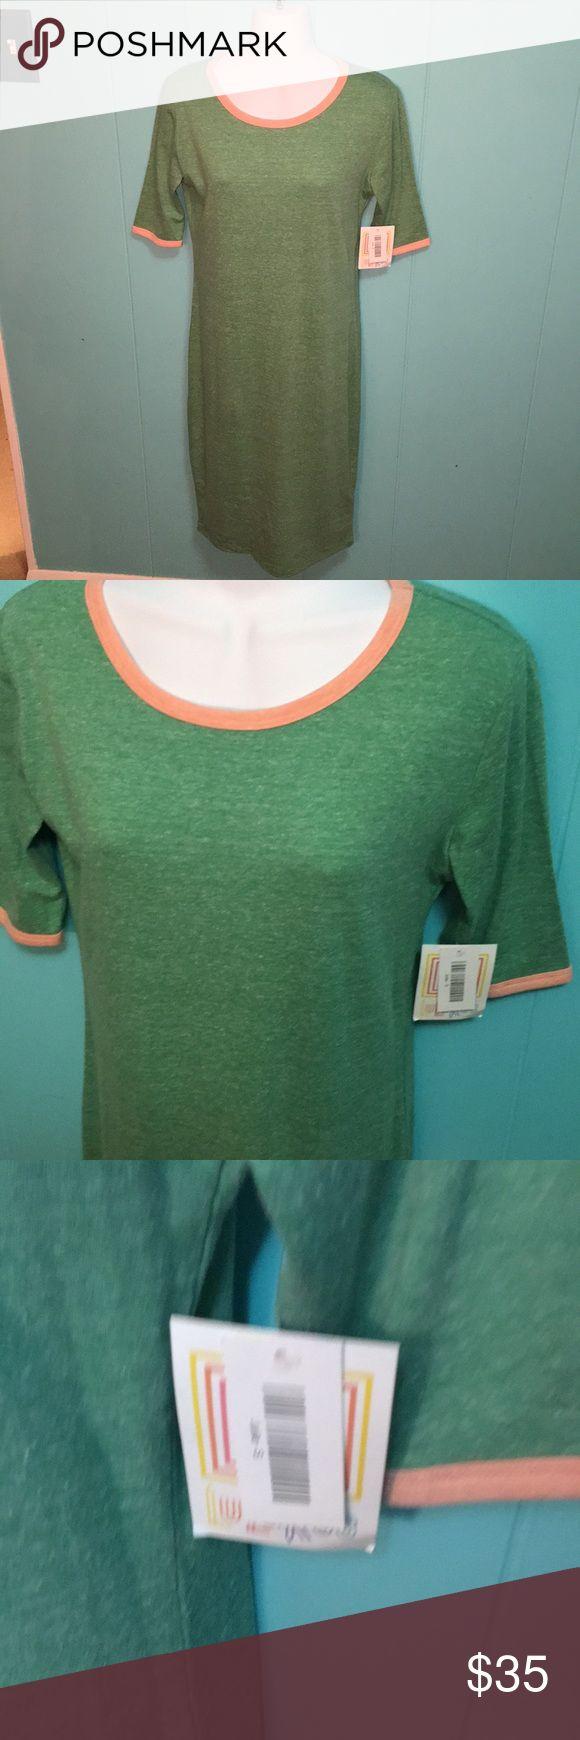 NWT Lularoe Julia dress Heather green NWT Lularoe Julia dress. Peach trim on Heather green. Size small LuLaRoe Dresses Maxi